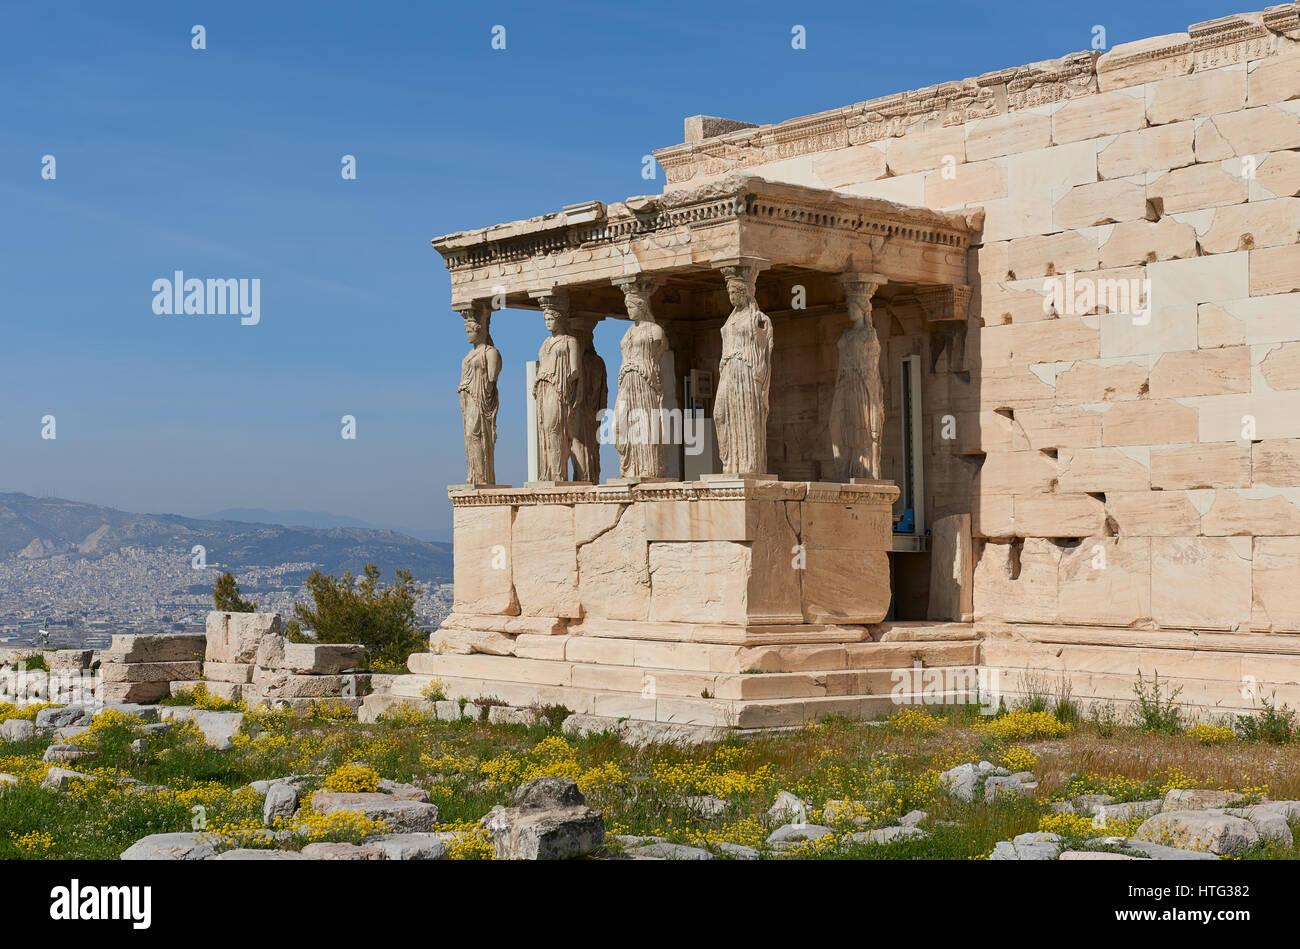 Caryatids at Acropolis of Athens - Stock Image